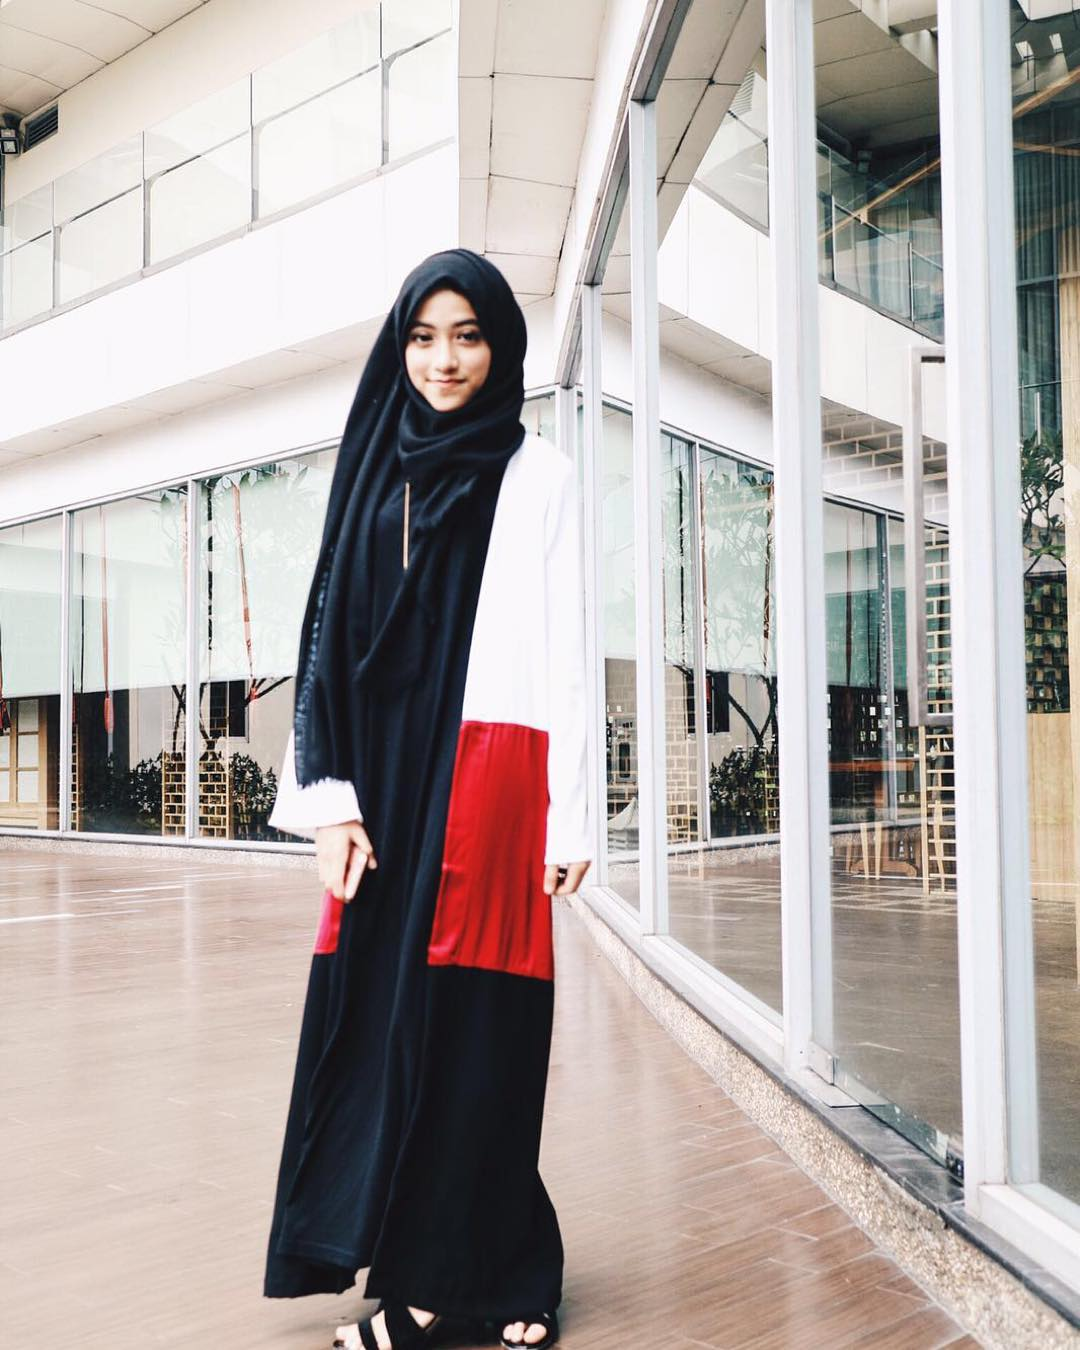 45+ Model Hijab Terbaru 2018: Simple, Modern & Elegan